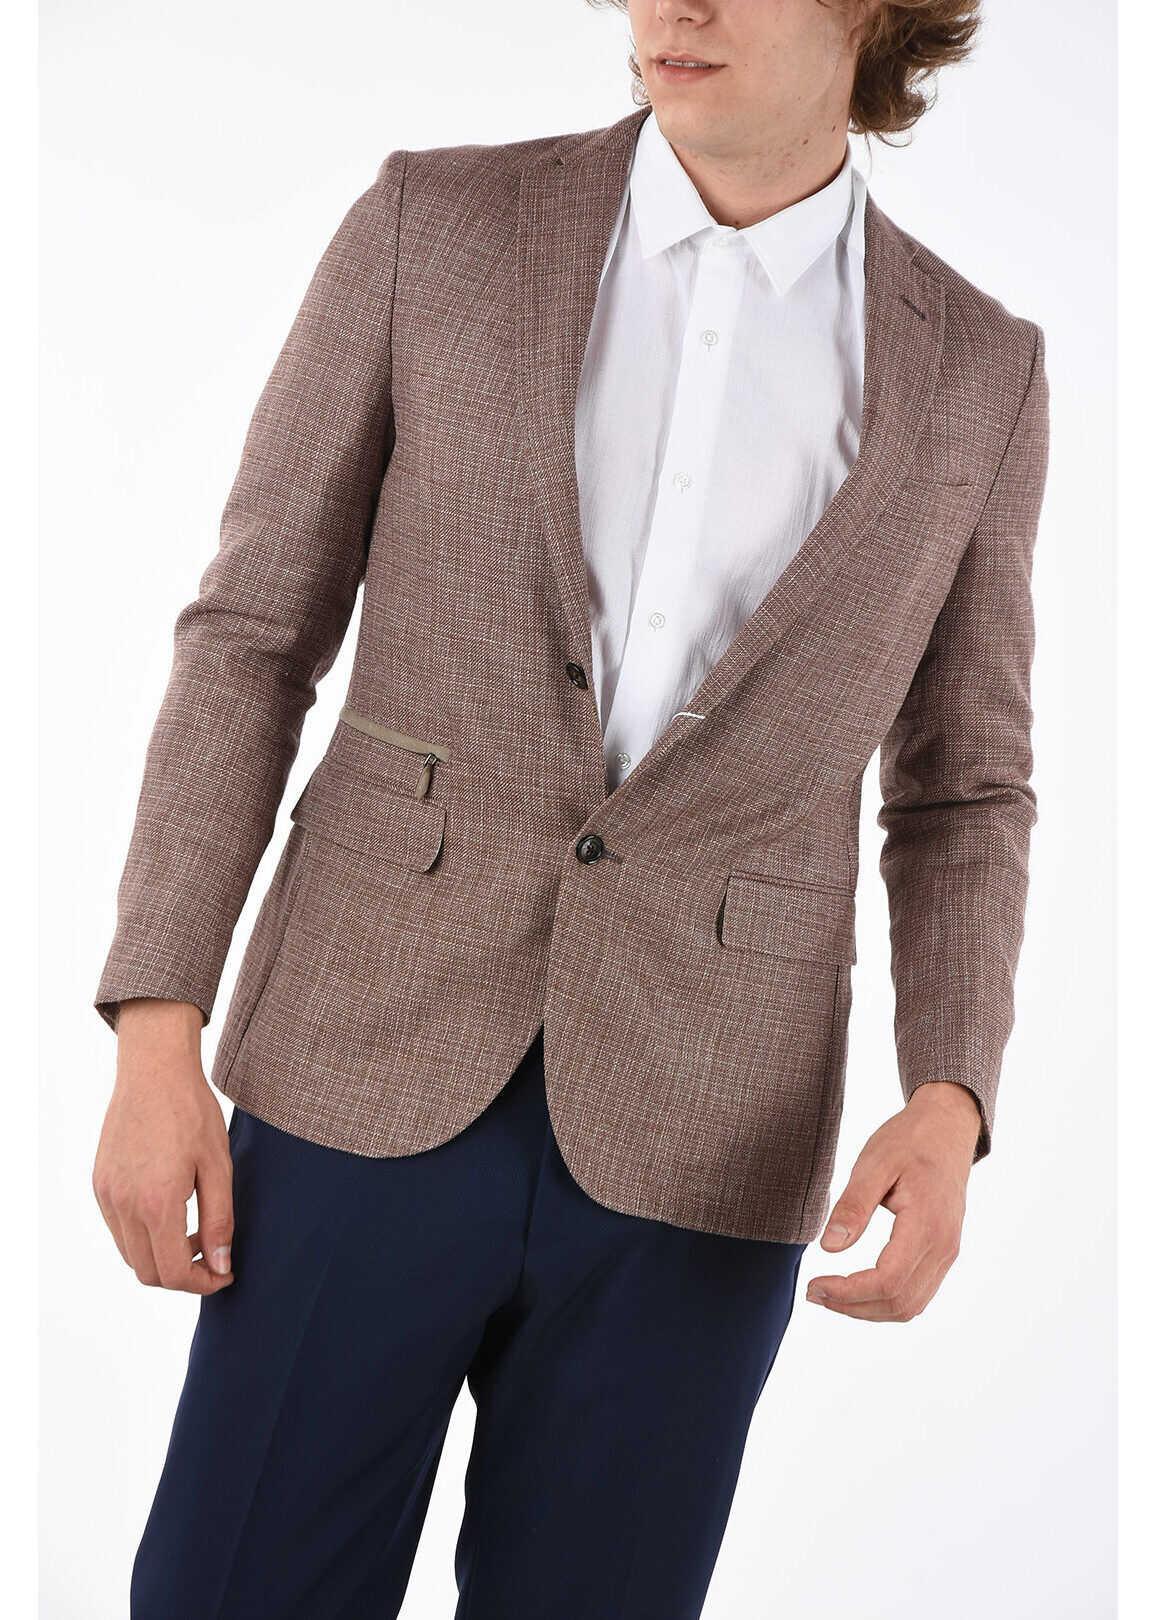 CORNELIANI fil à fil flap pocket 2-button blazer BROWN imagine